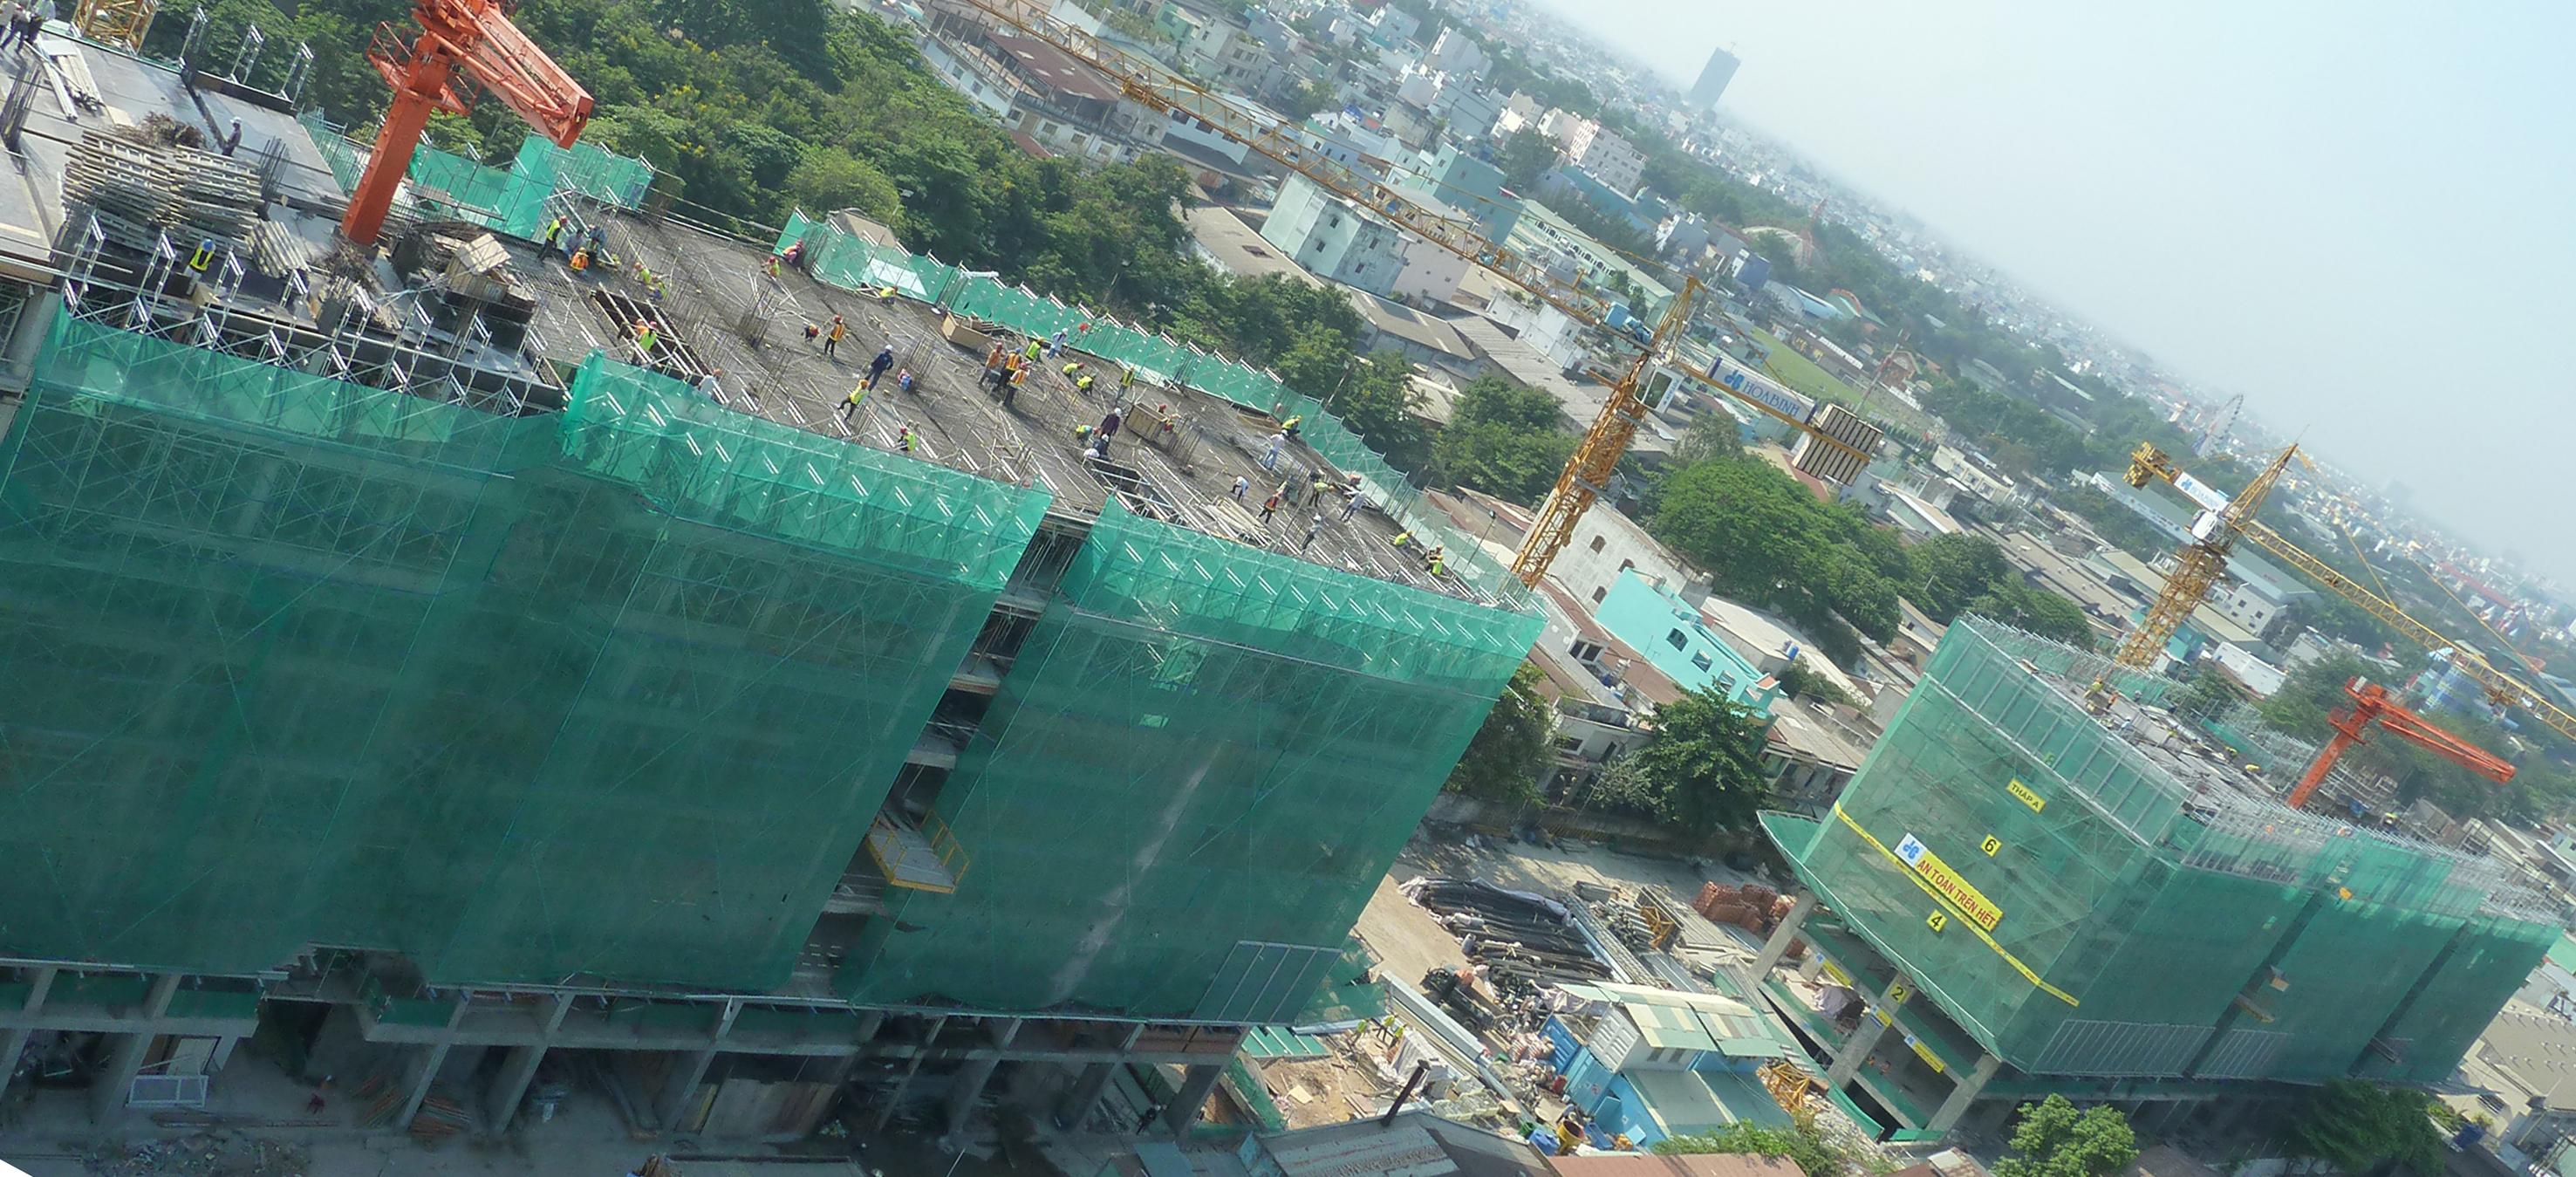 Cong-trinh-20110414.jpg